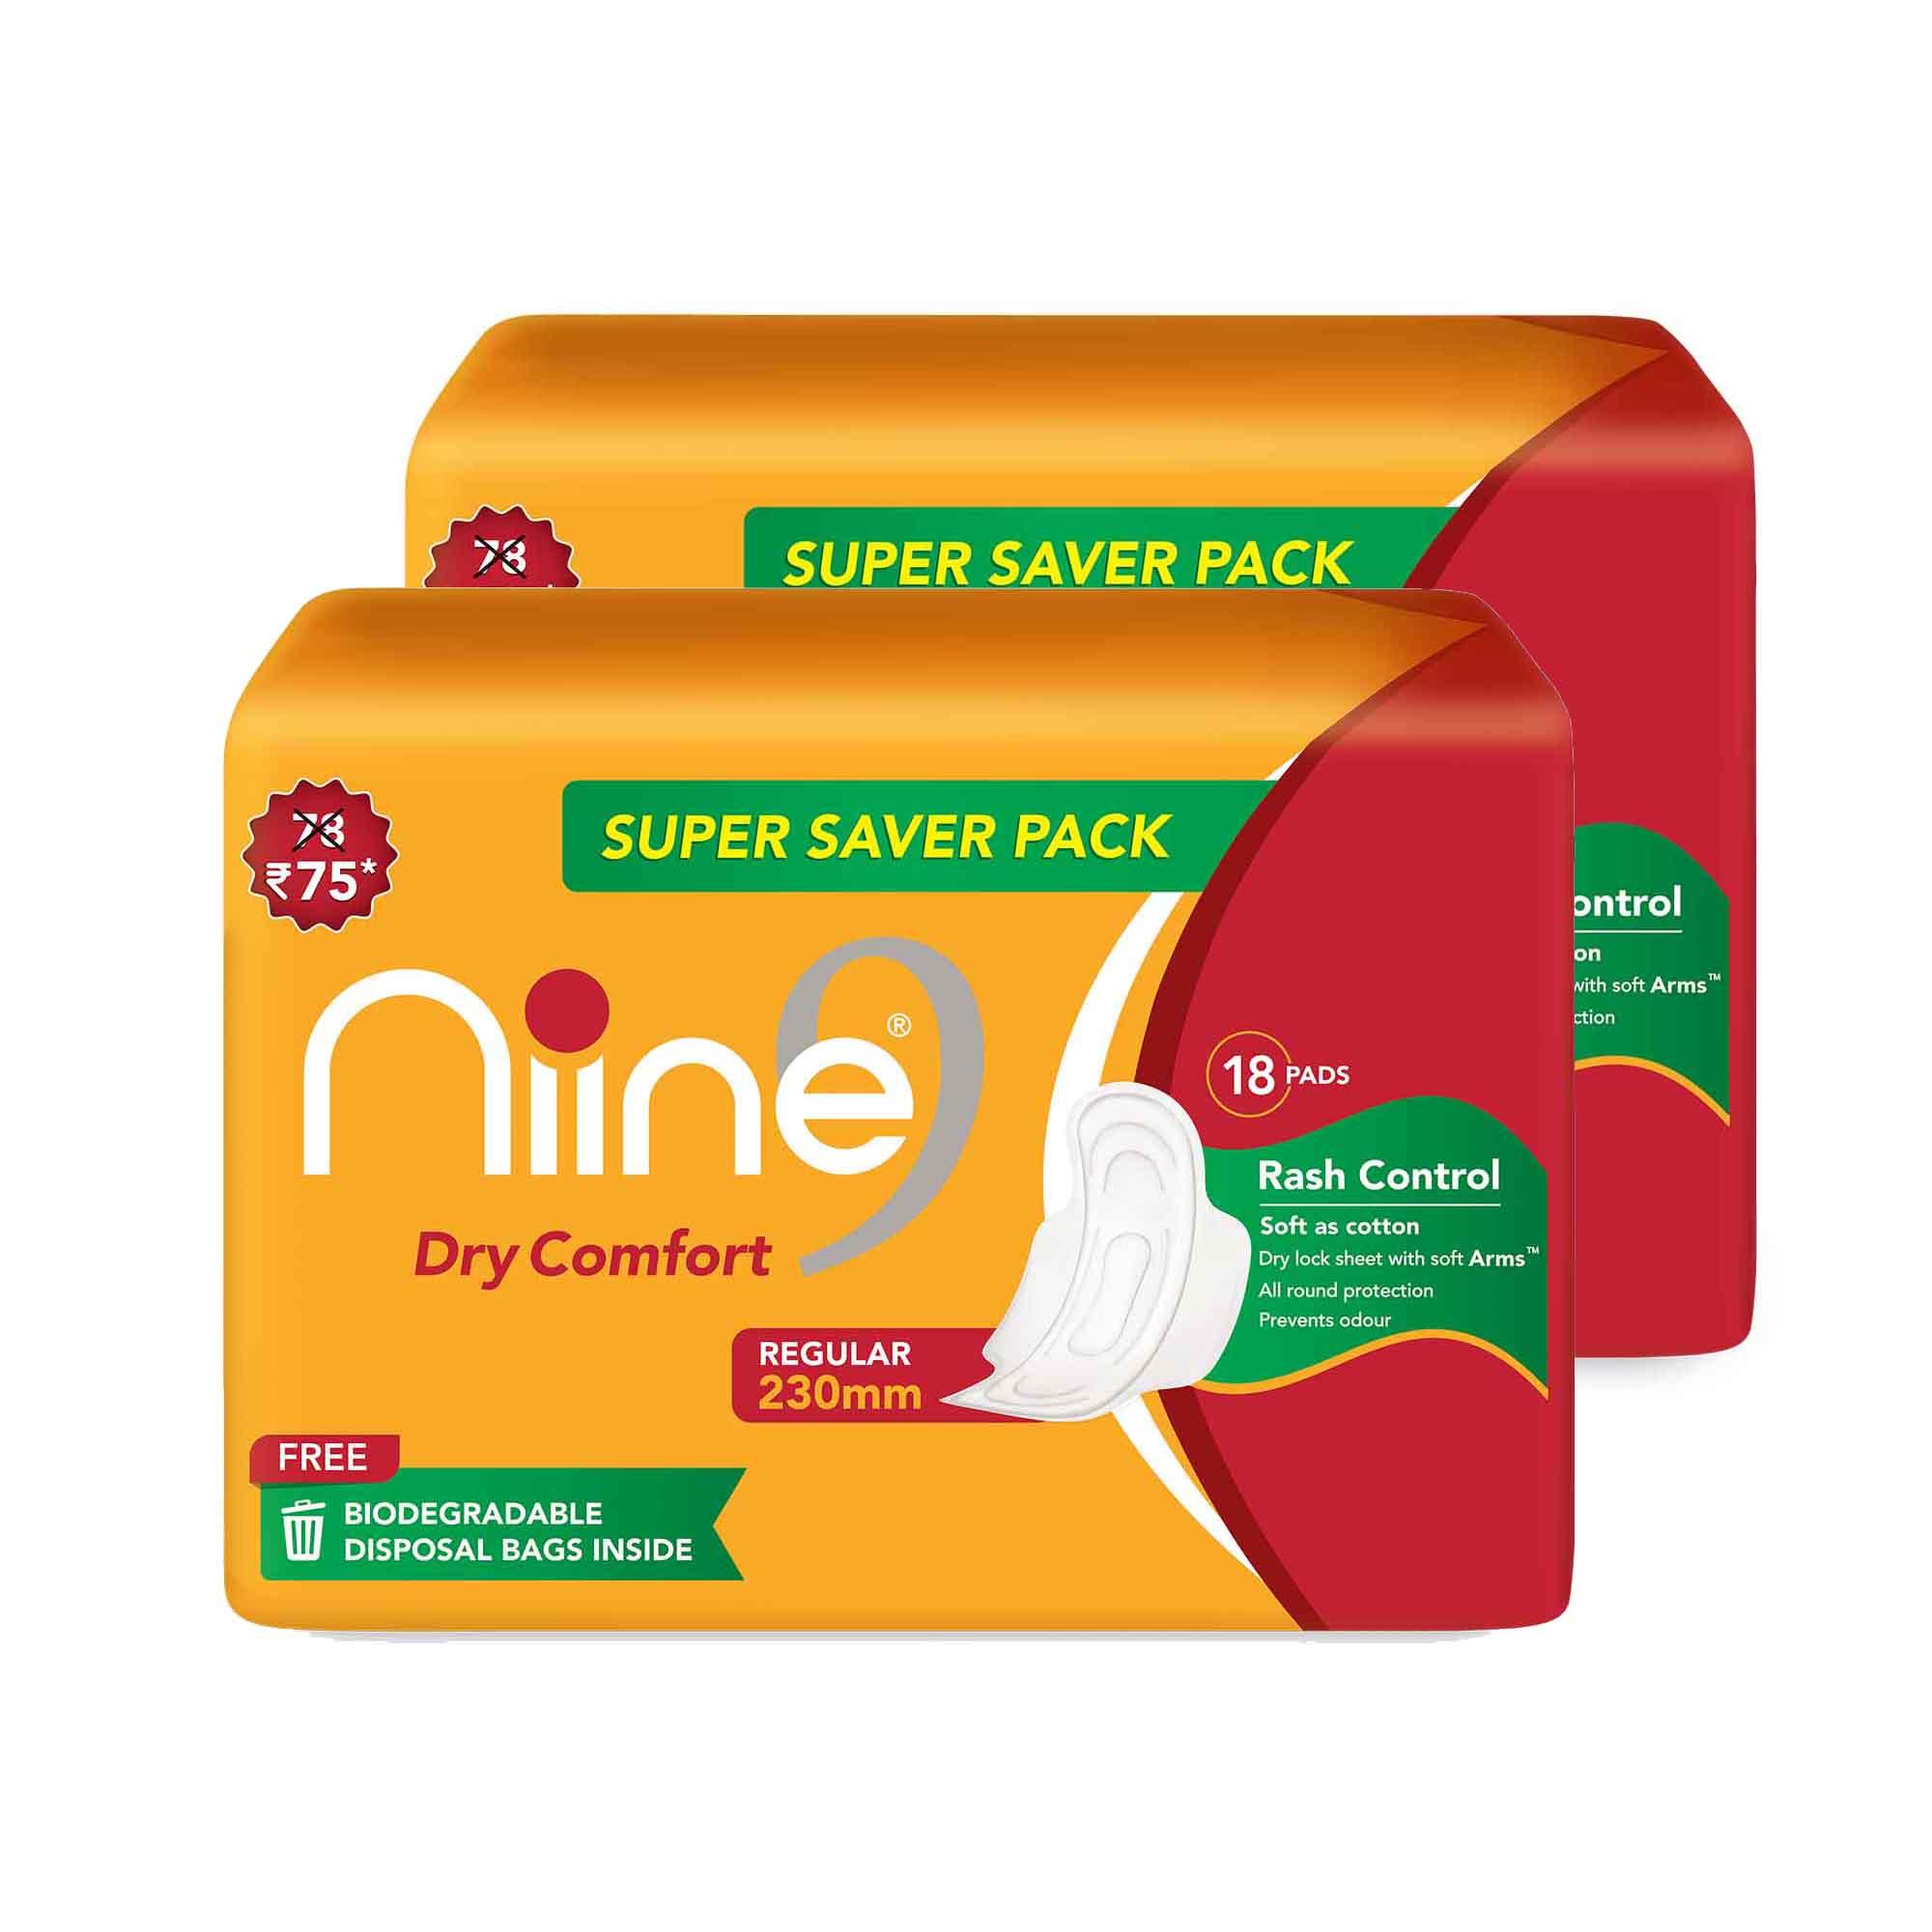 NIINE   Niine Dry Comfort Regular SUPER SAVER PACK Sanitary Napkins for Women